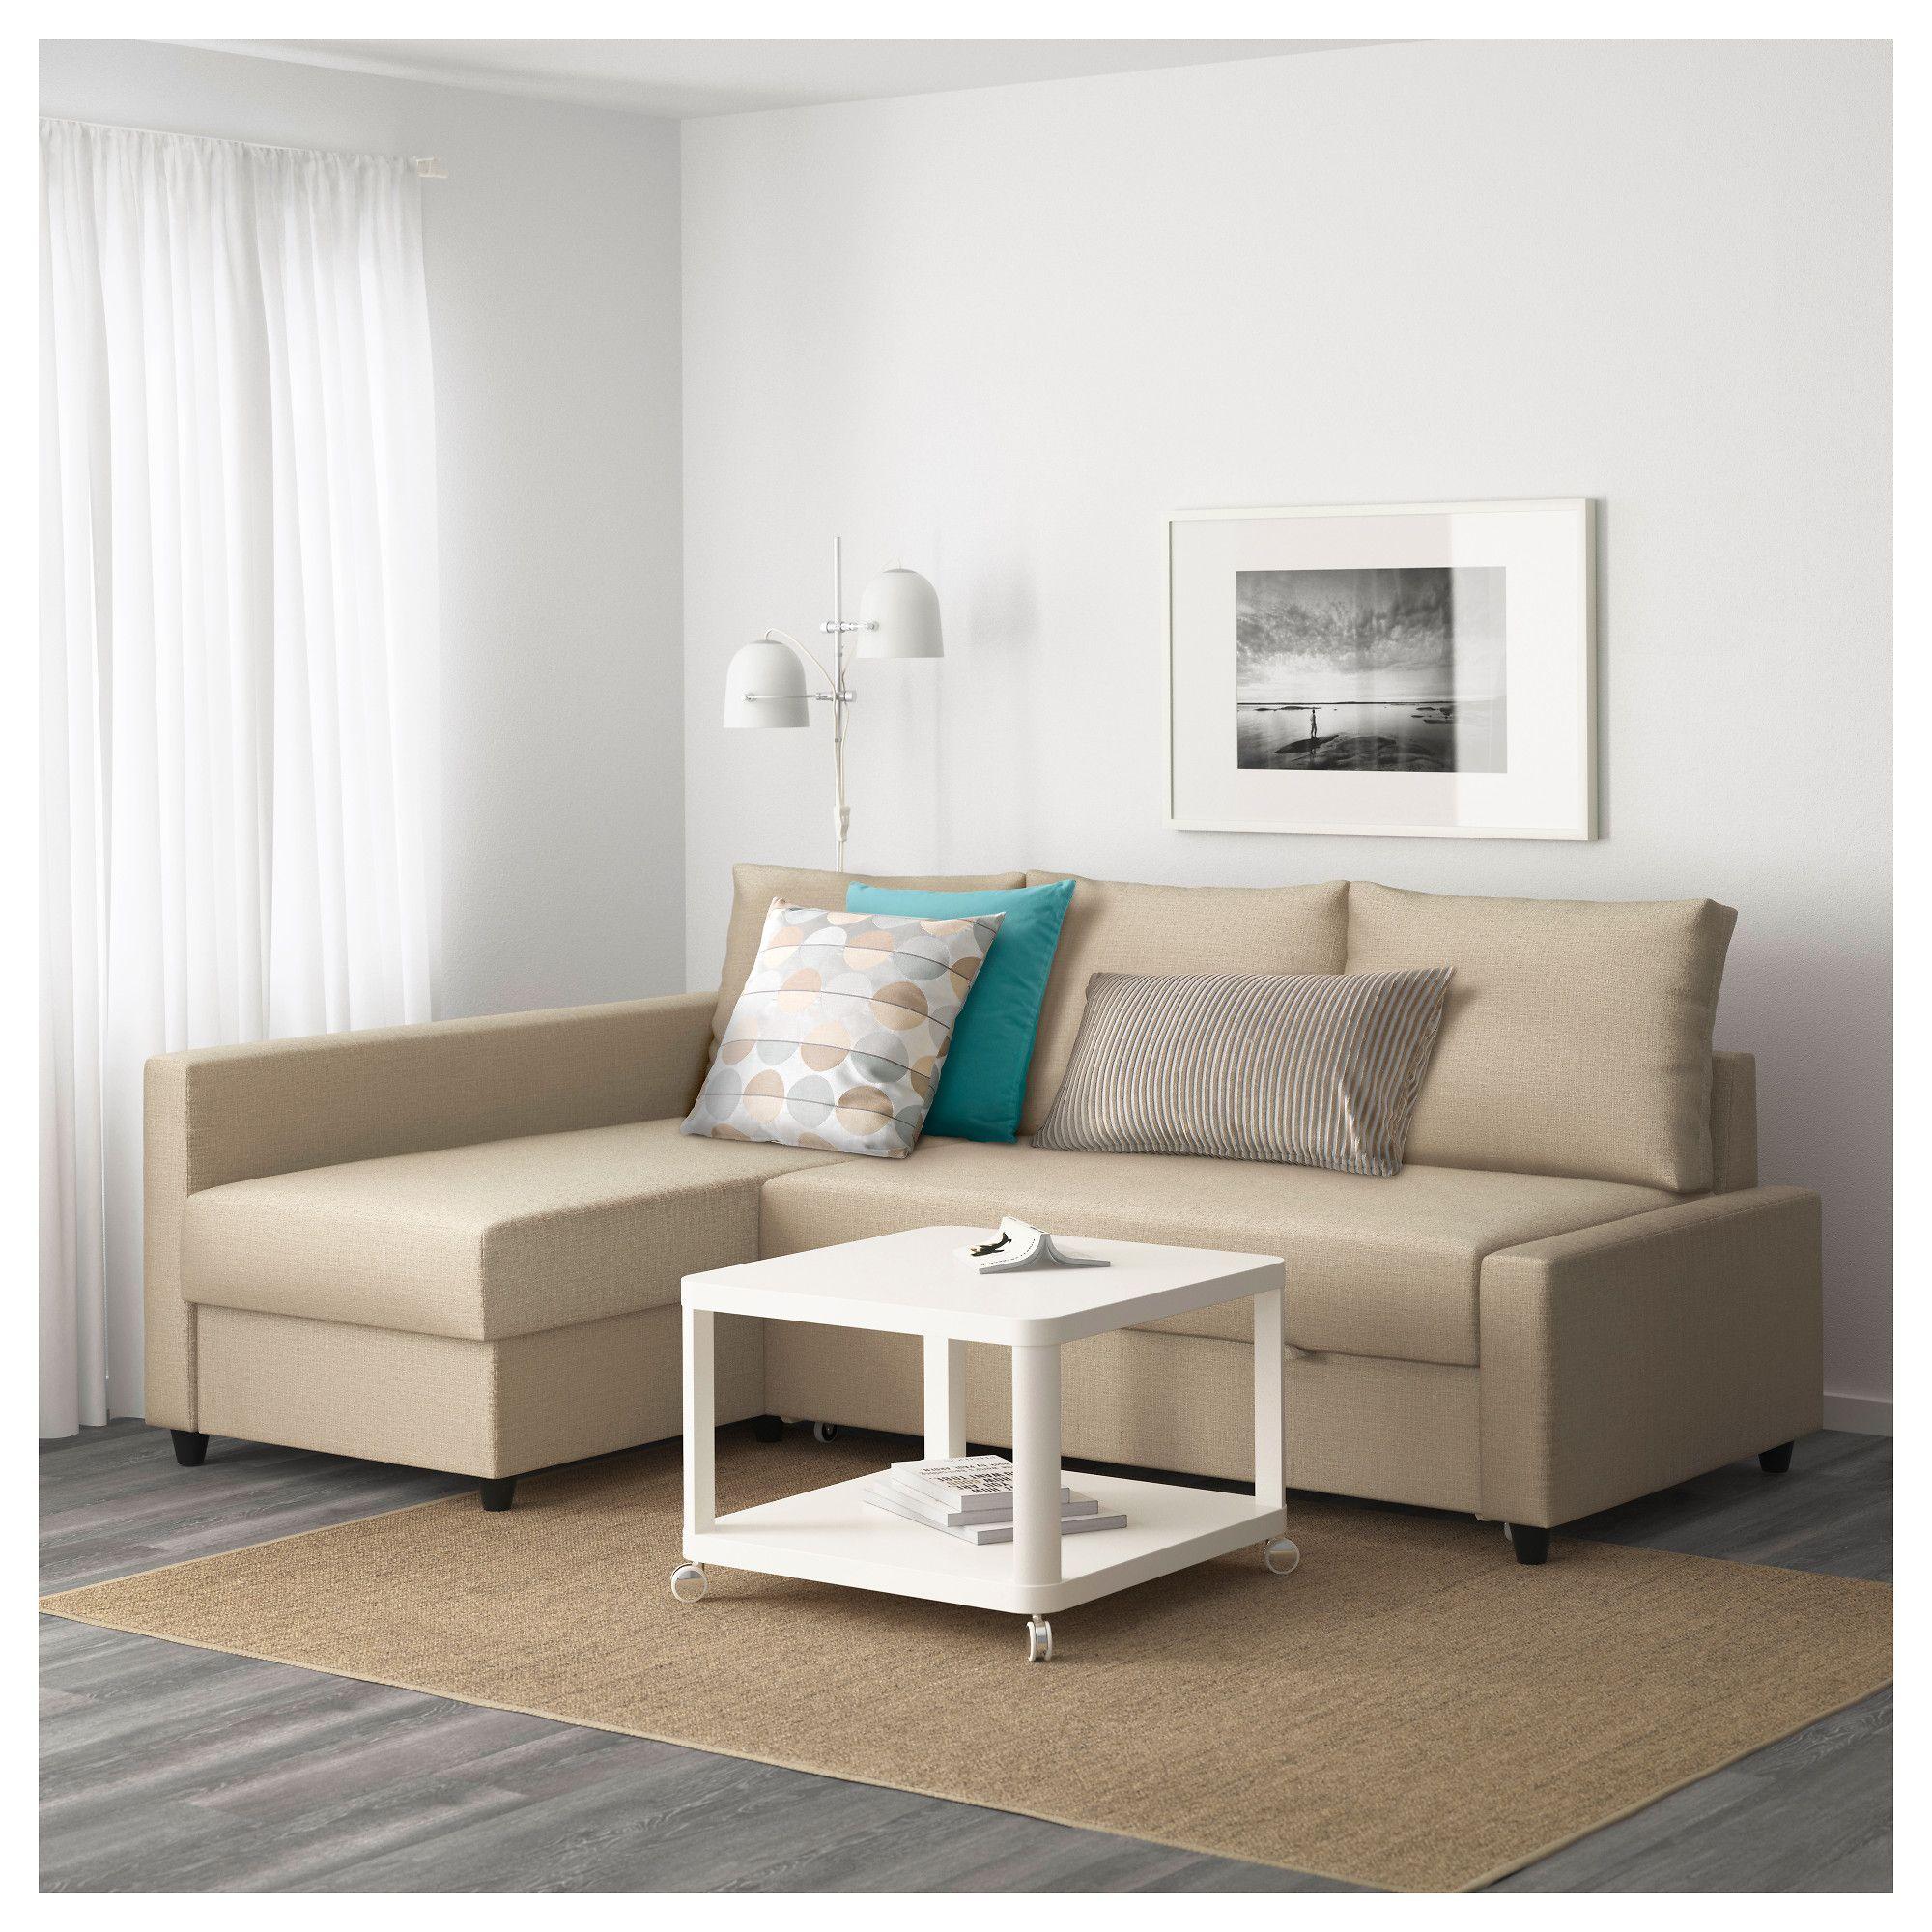 IKEA FRIHETEN Corner sofa bed with storage Skiftebo beige